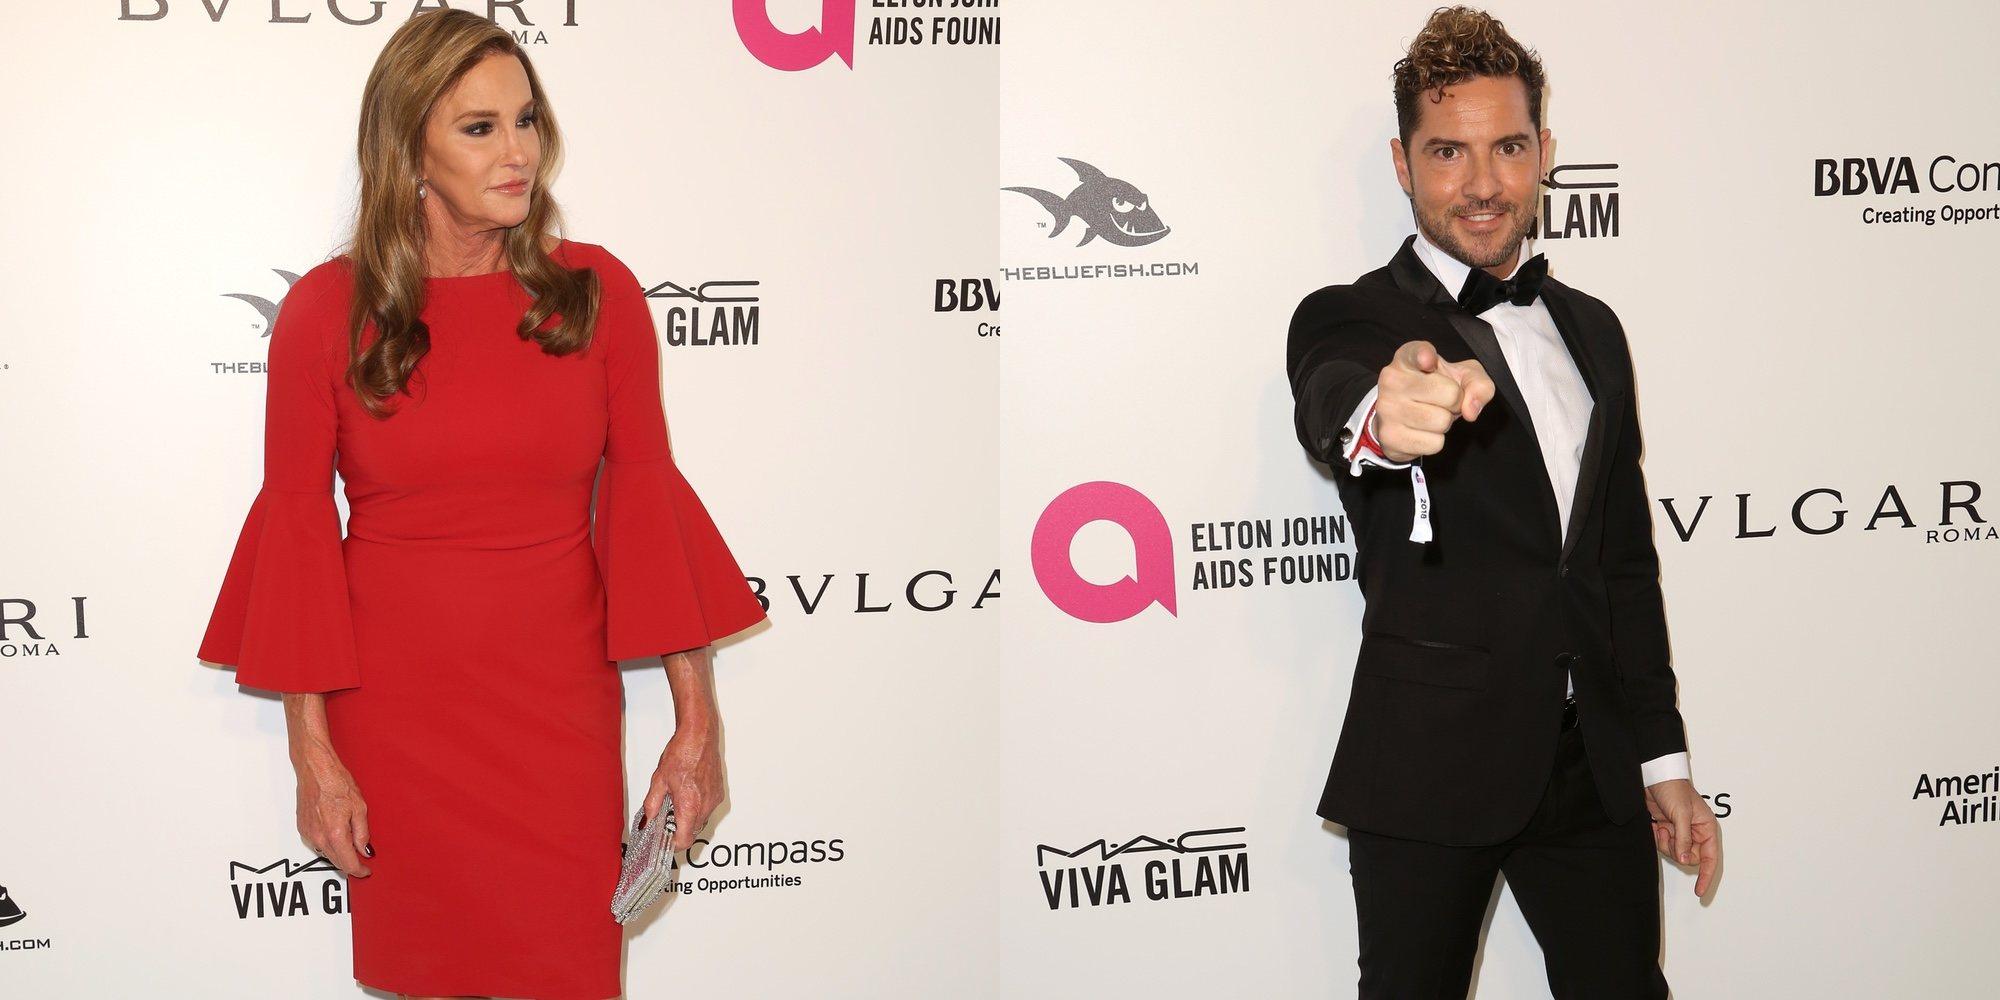 David Bisbal se divierte en la Fiesta de Elton John tras los Oscar 2018 junto a Ricky Martin y Caitlyn Jenner